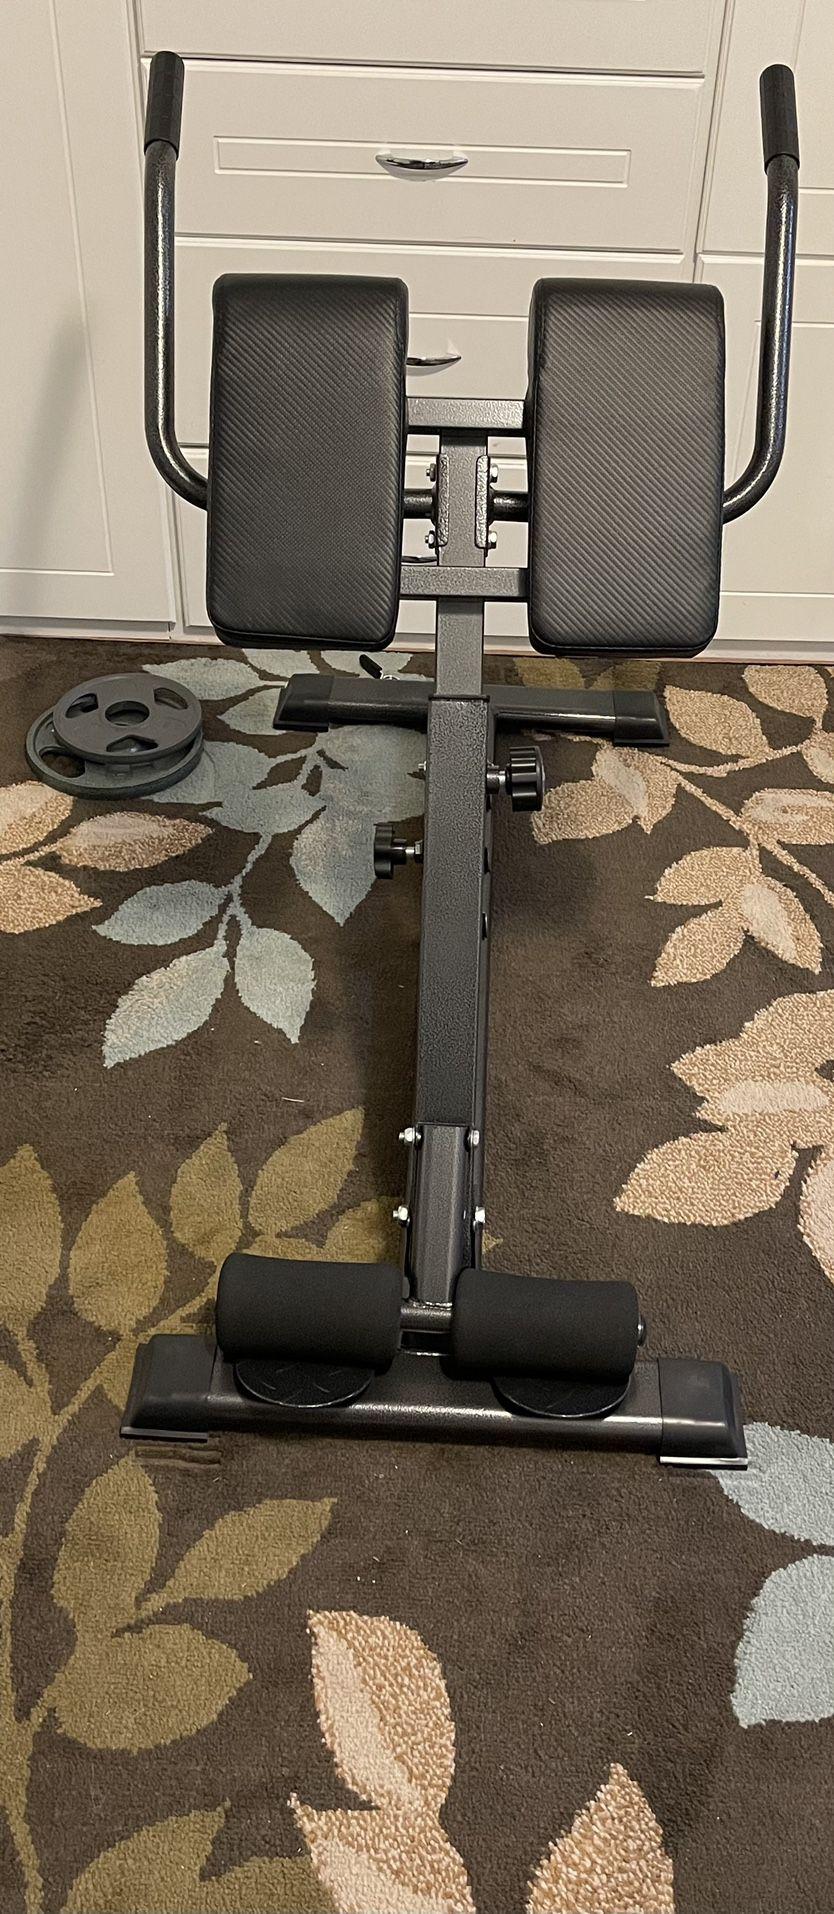 ComMax Roman Chair Back Hyper Extension 30-40-50 Degree Adjustabke